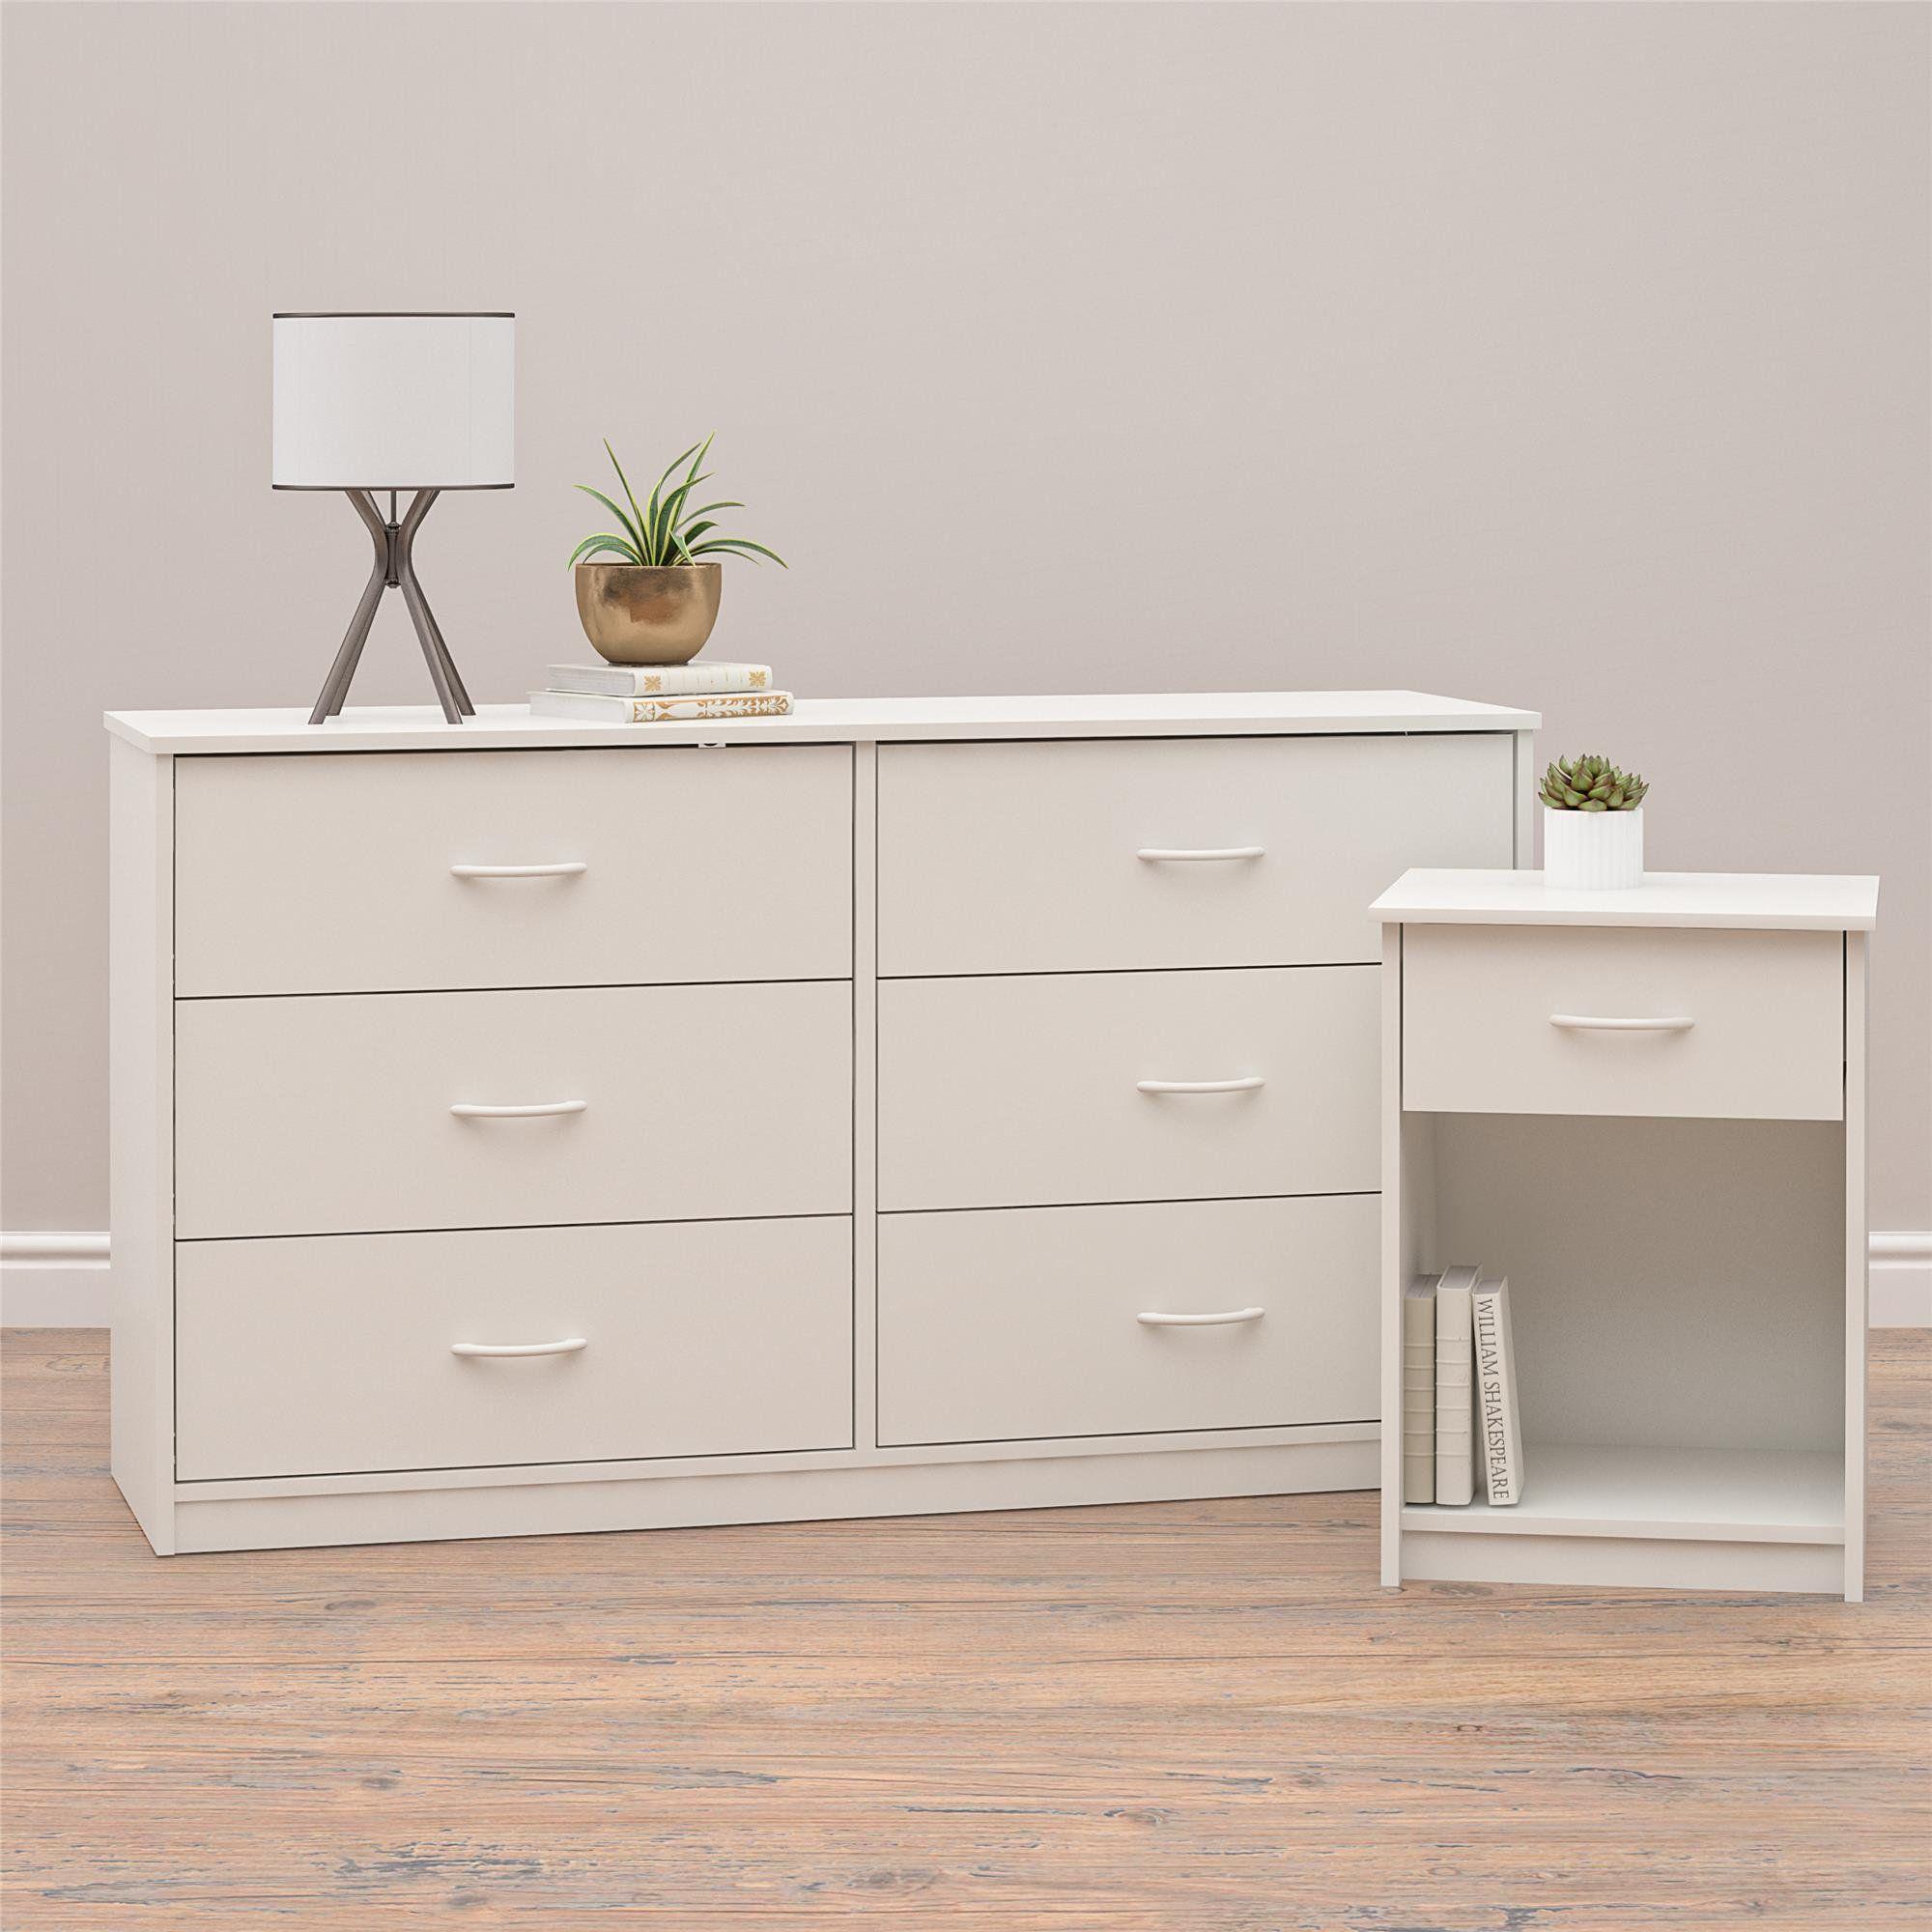 Mainstays Classic 6 Drawer Dresser White Finish Walmart Com In 2021 Dresser Drawers 6 Drawer Dresser Drawers [ 2000 x 2000 Pixel ]